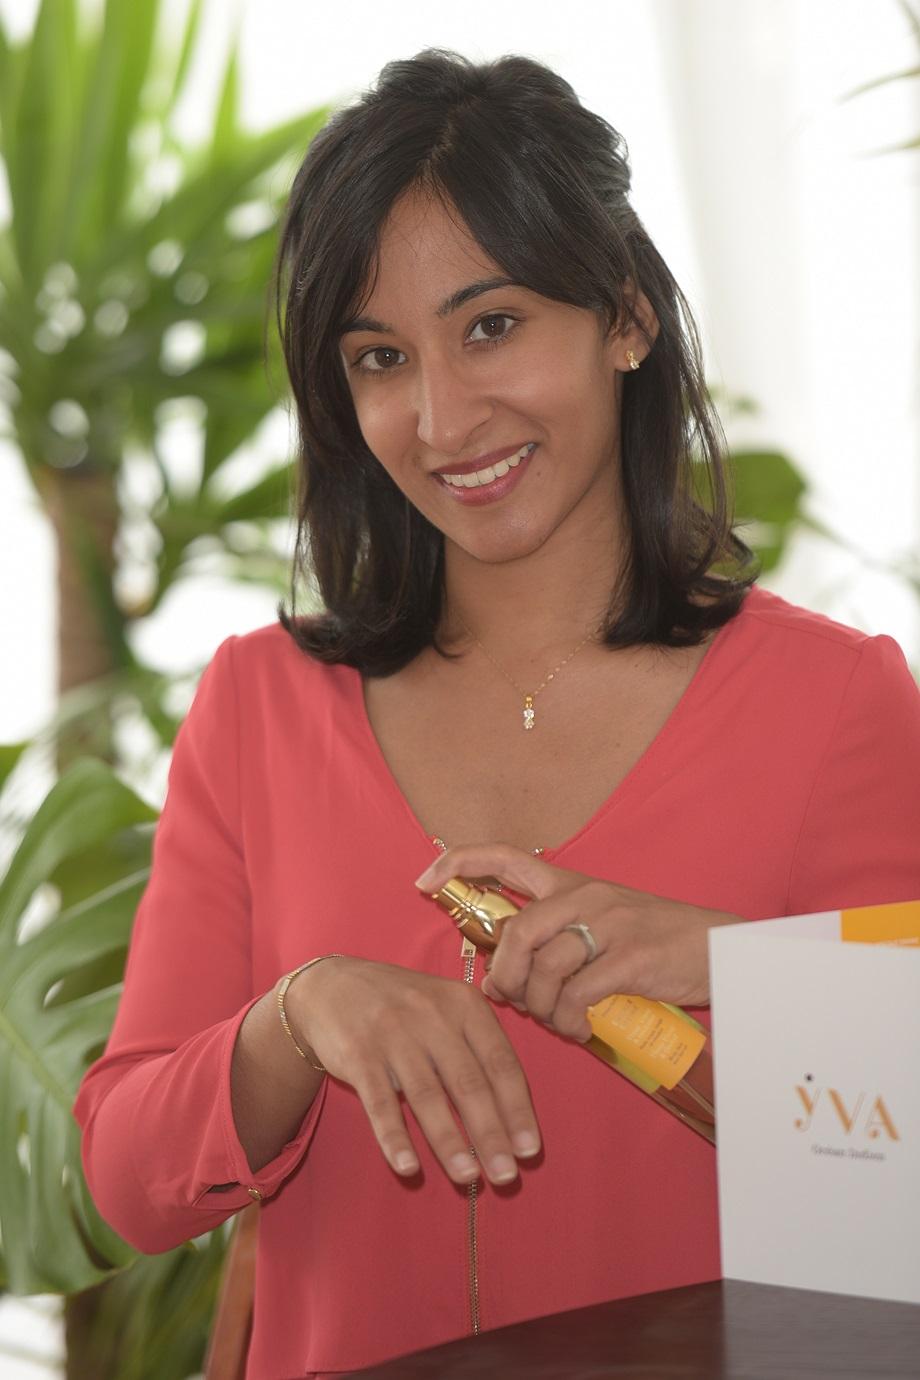 Yvana Nourmamod Jul015 (97)